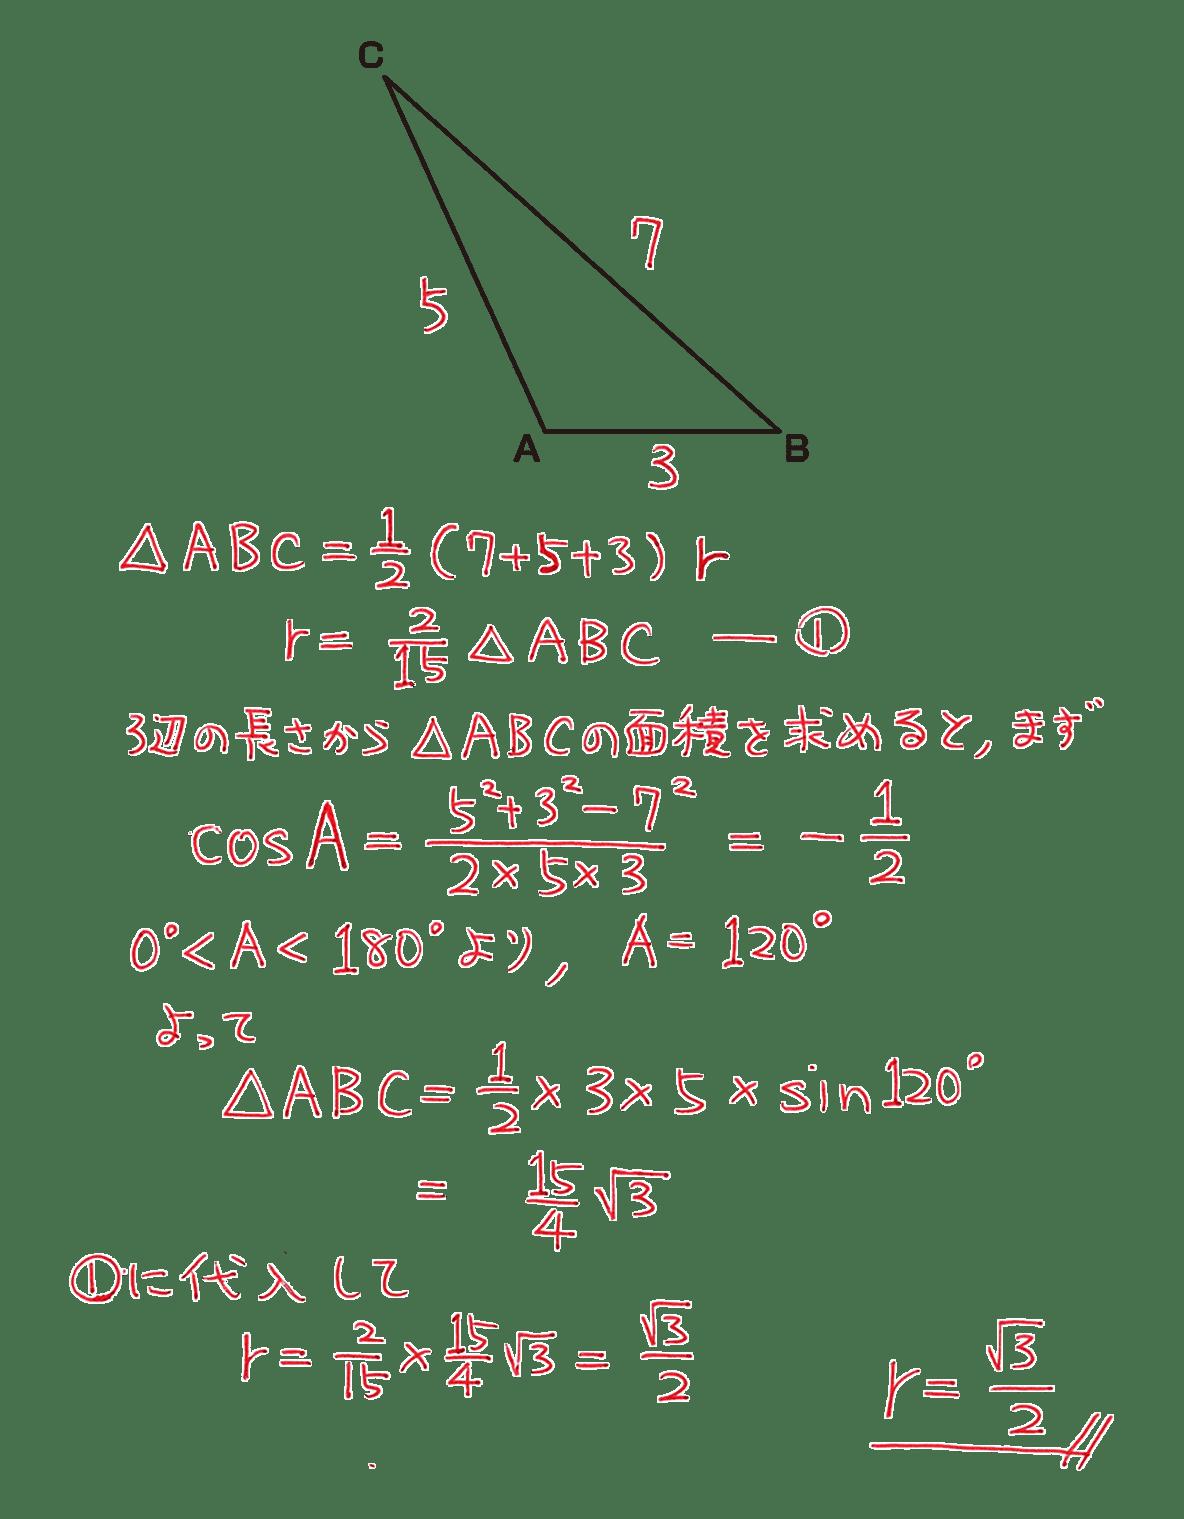 高校数学Ⅰ 三角比33 練習の答え